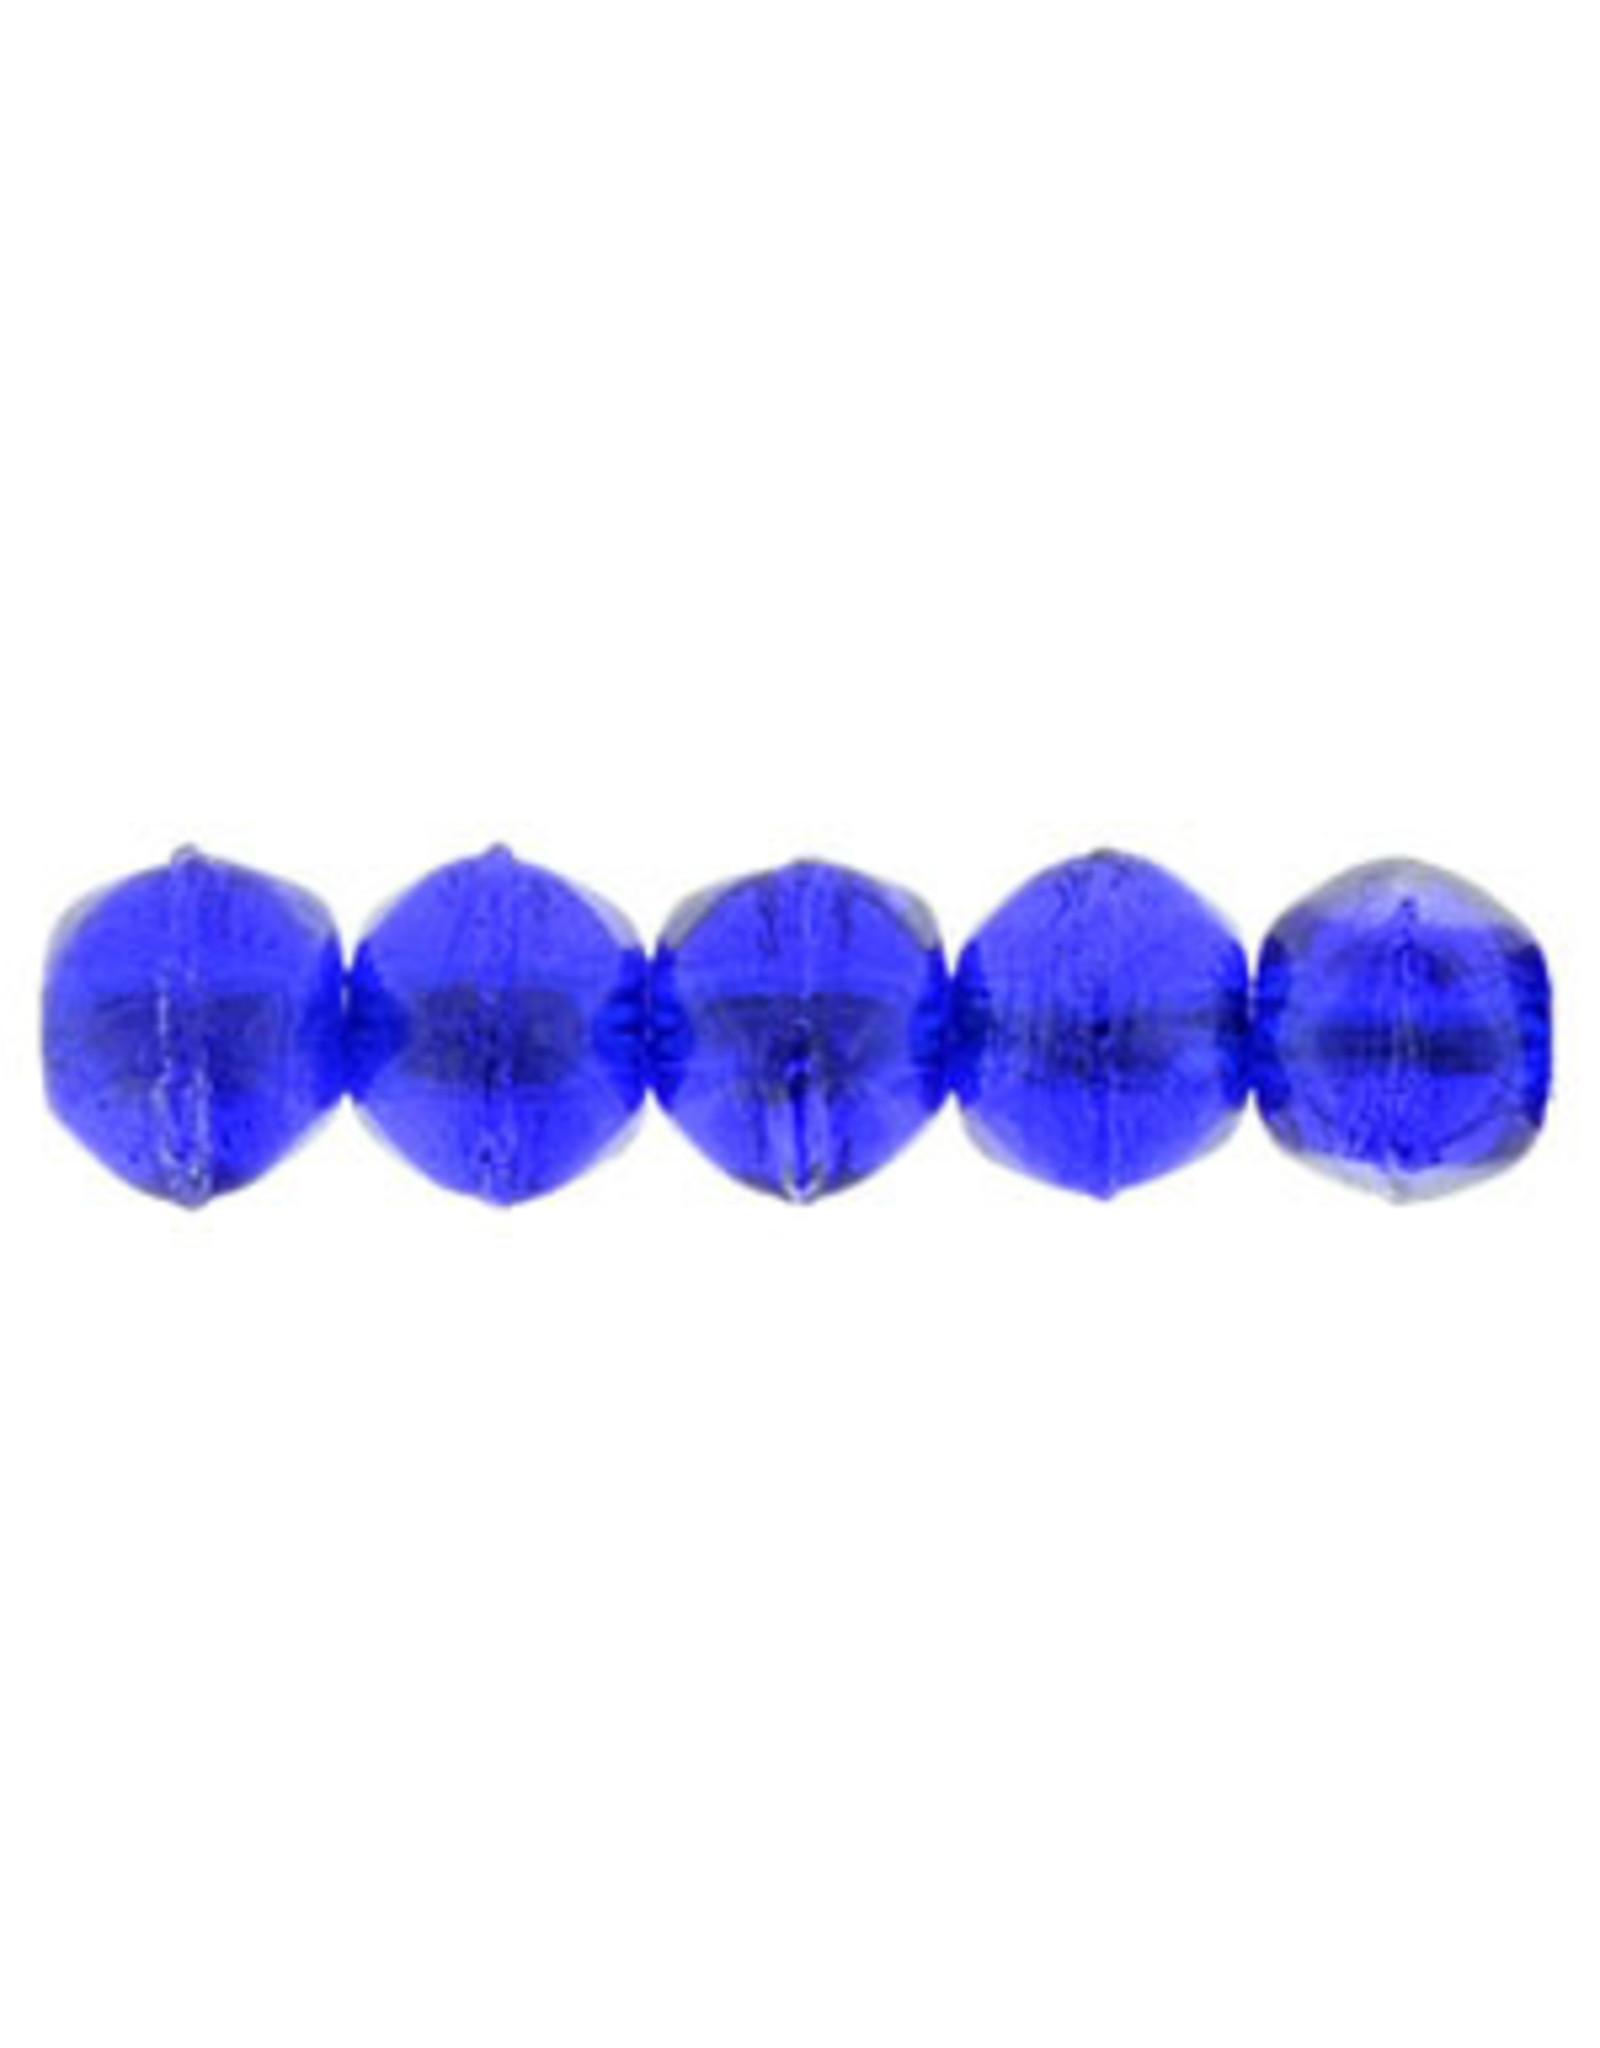 3009 3mm English Cut Cobalt Blue x50